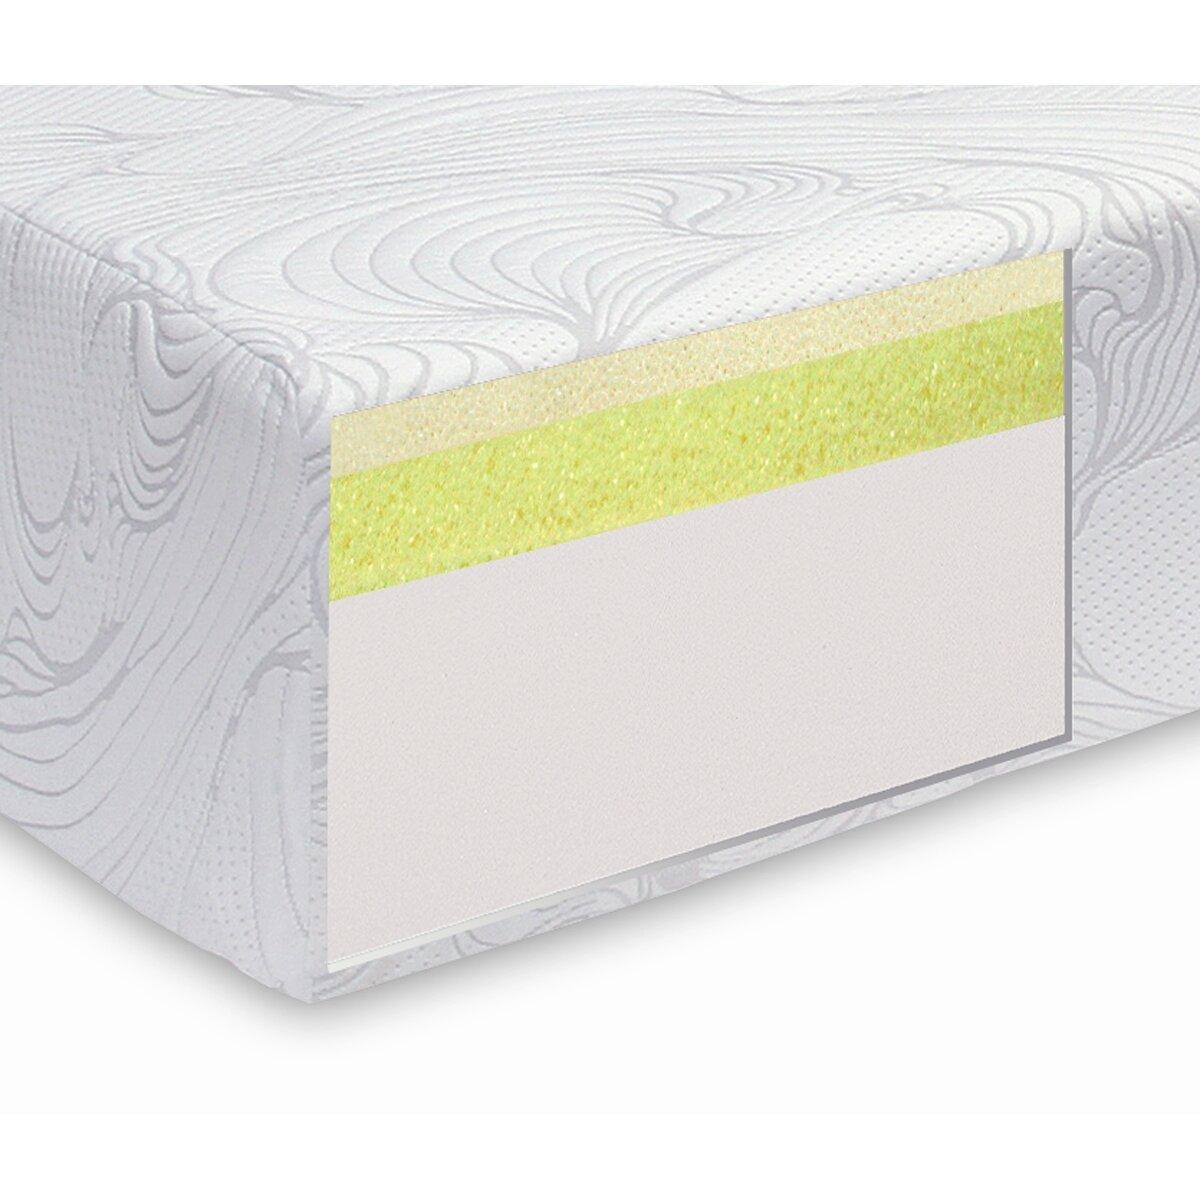 "Tobia Natural Sleep Gemma 10"" Plush Memory Foam Mattress"